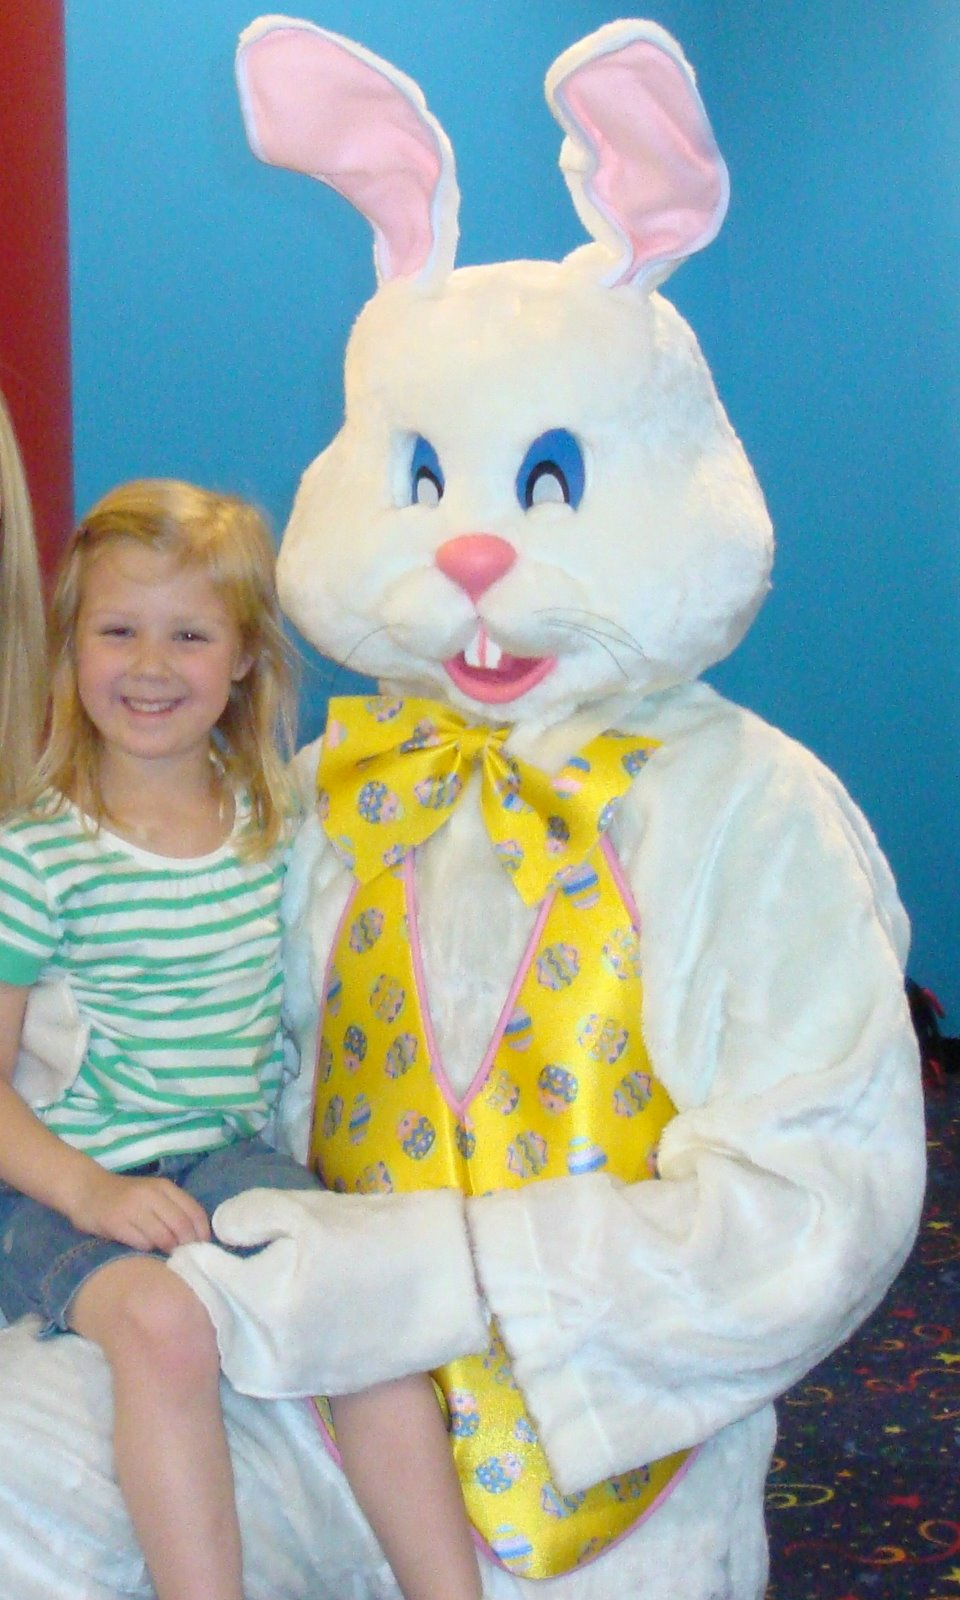 [elise+easter+bunny.jpg]